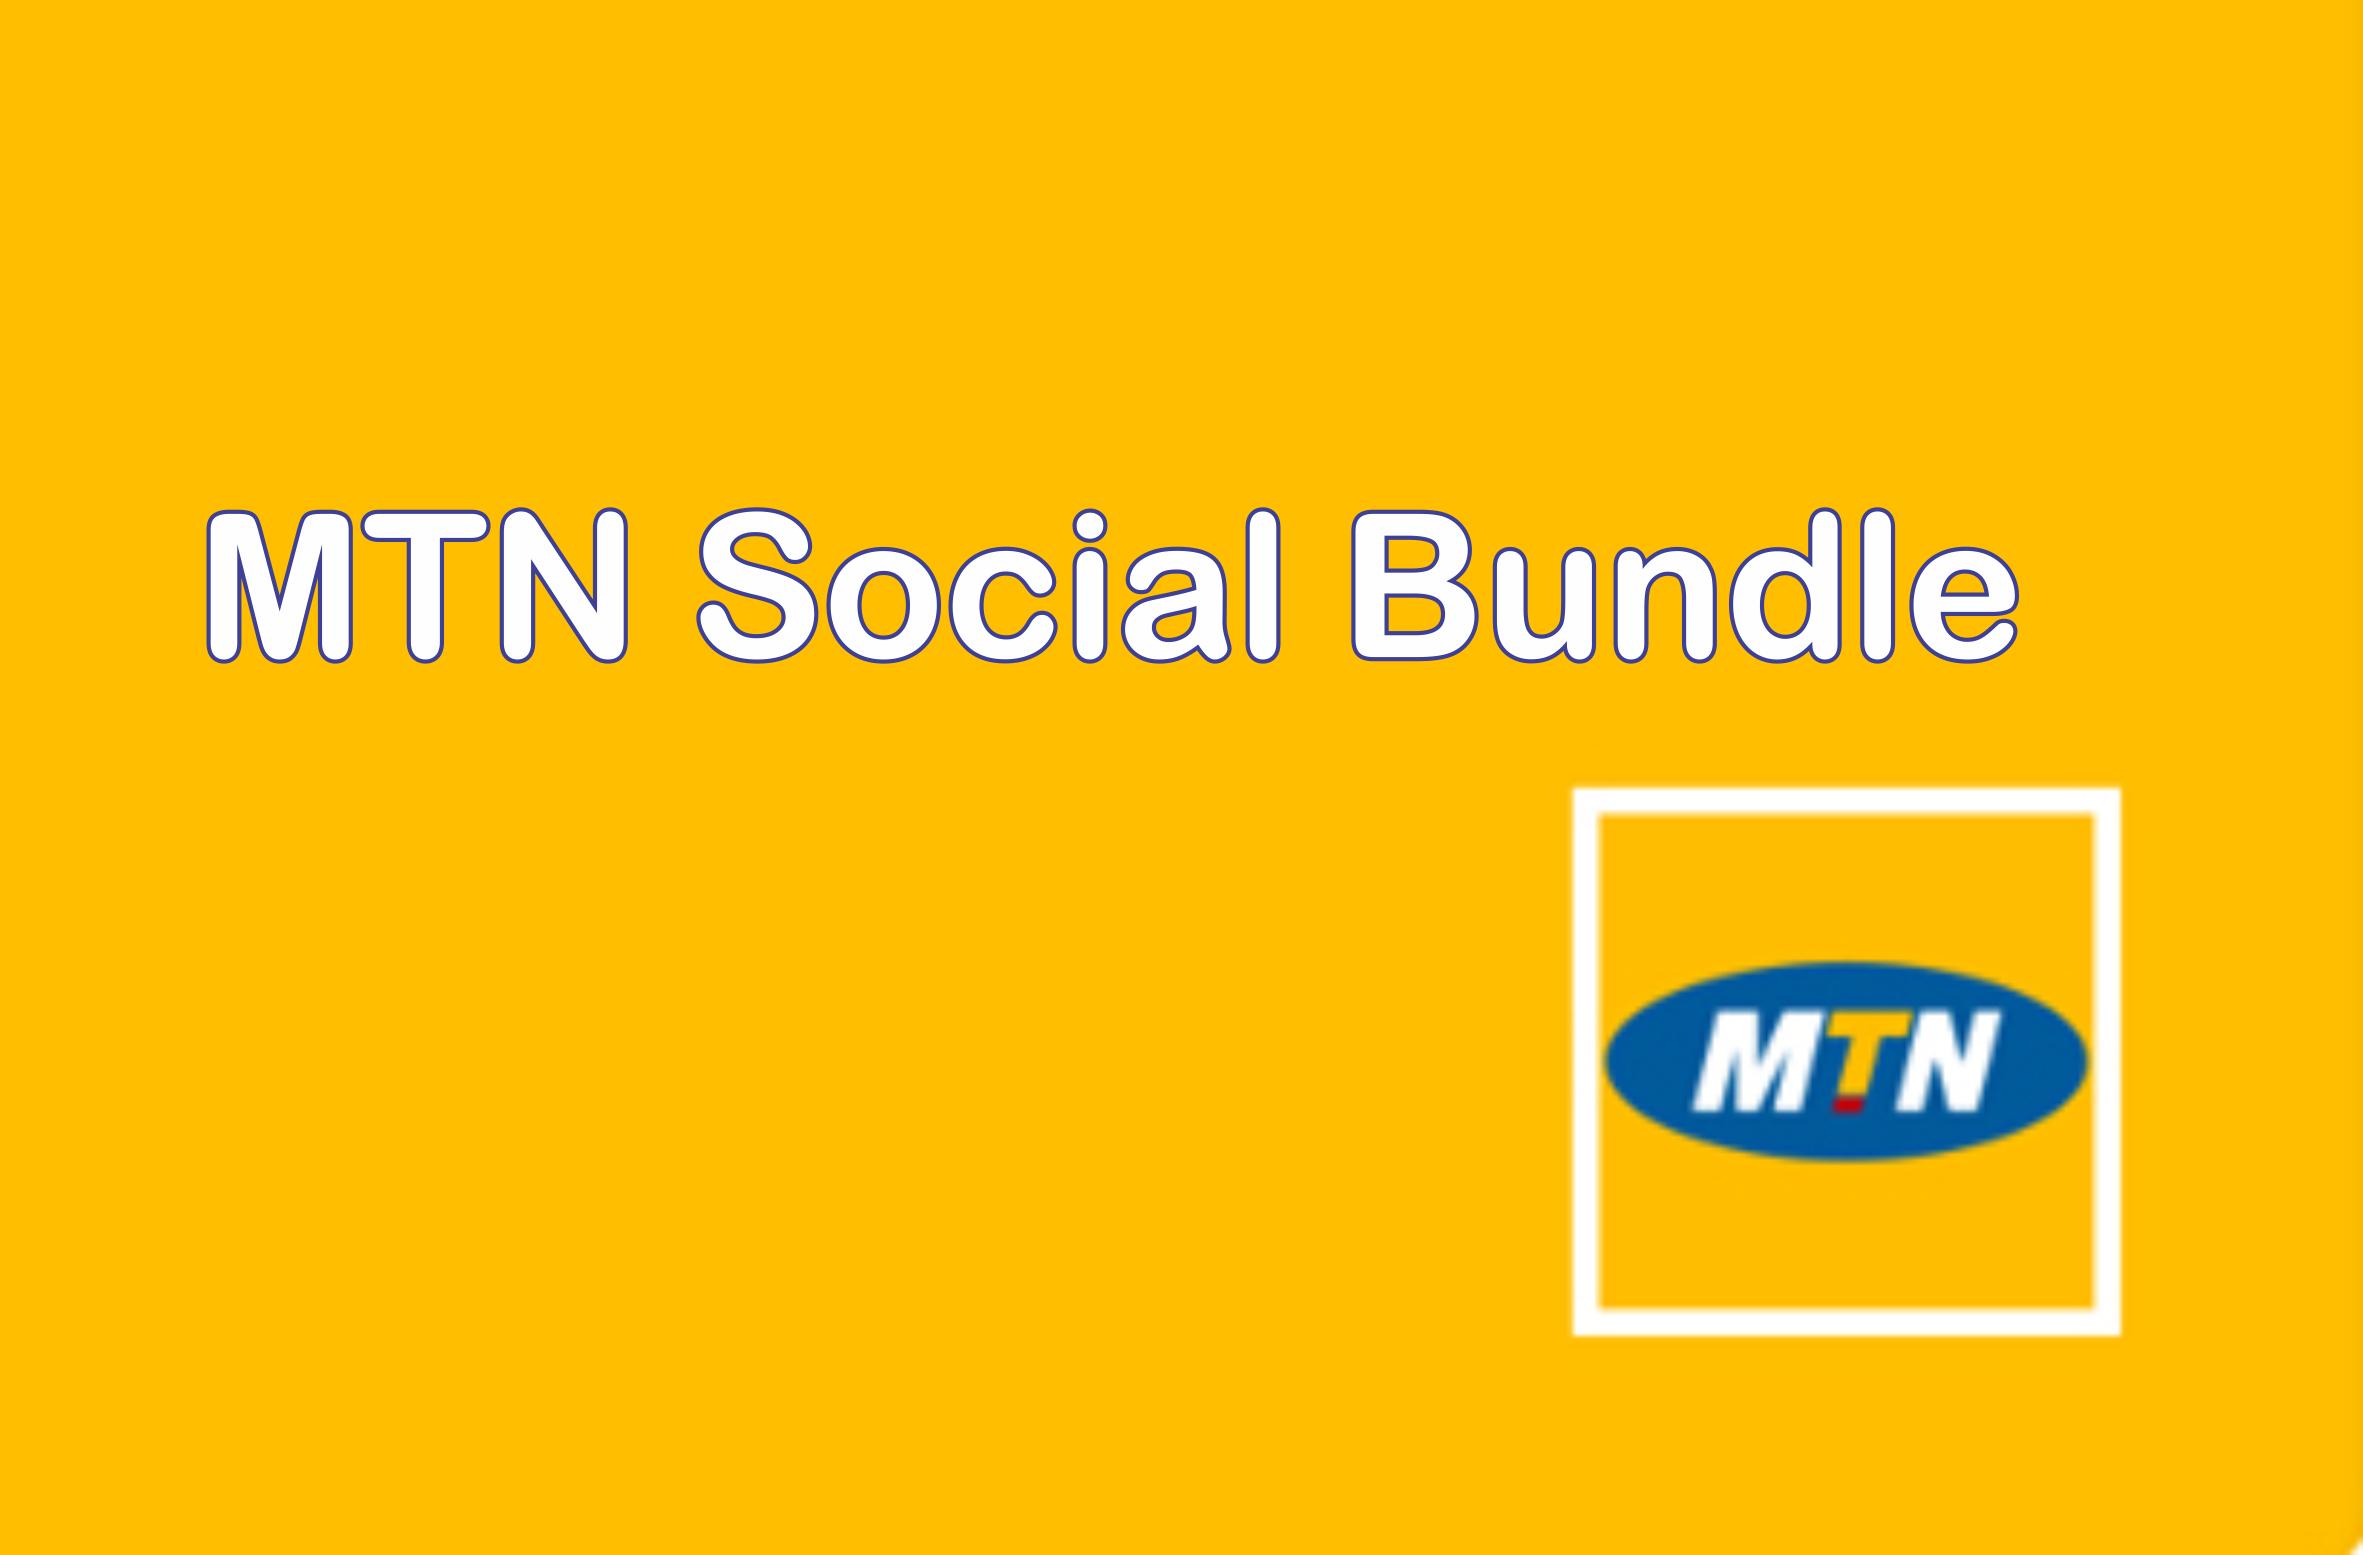 mtn social bundles